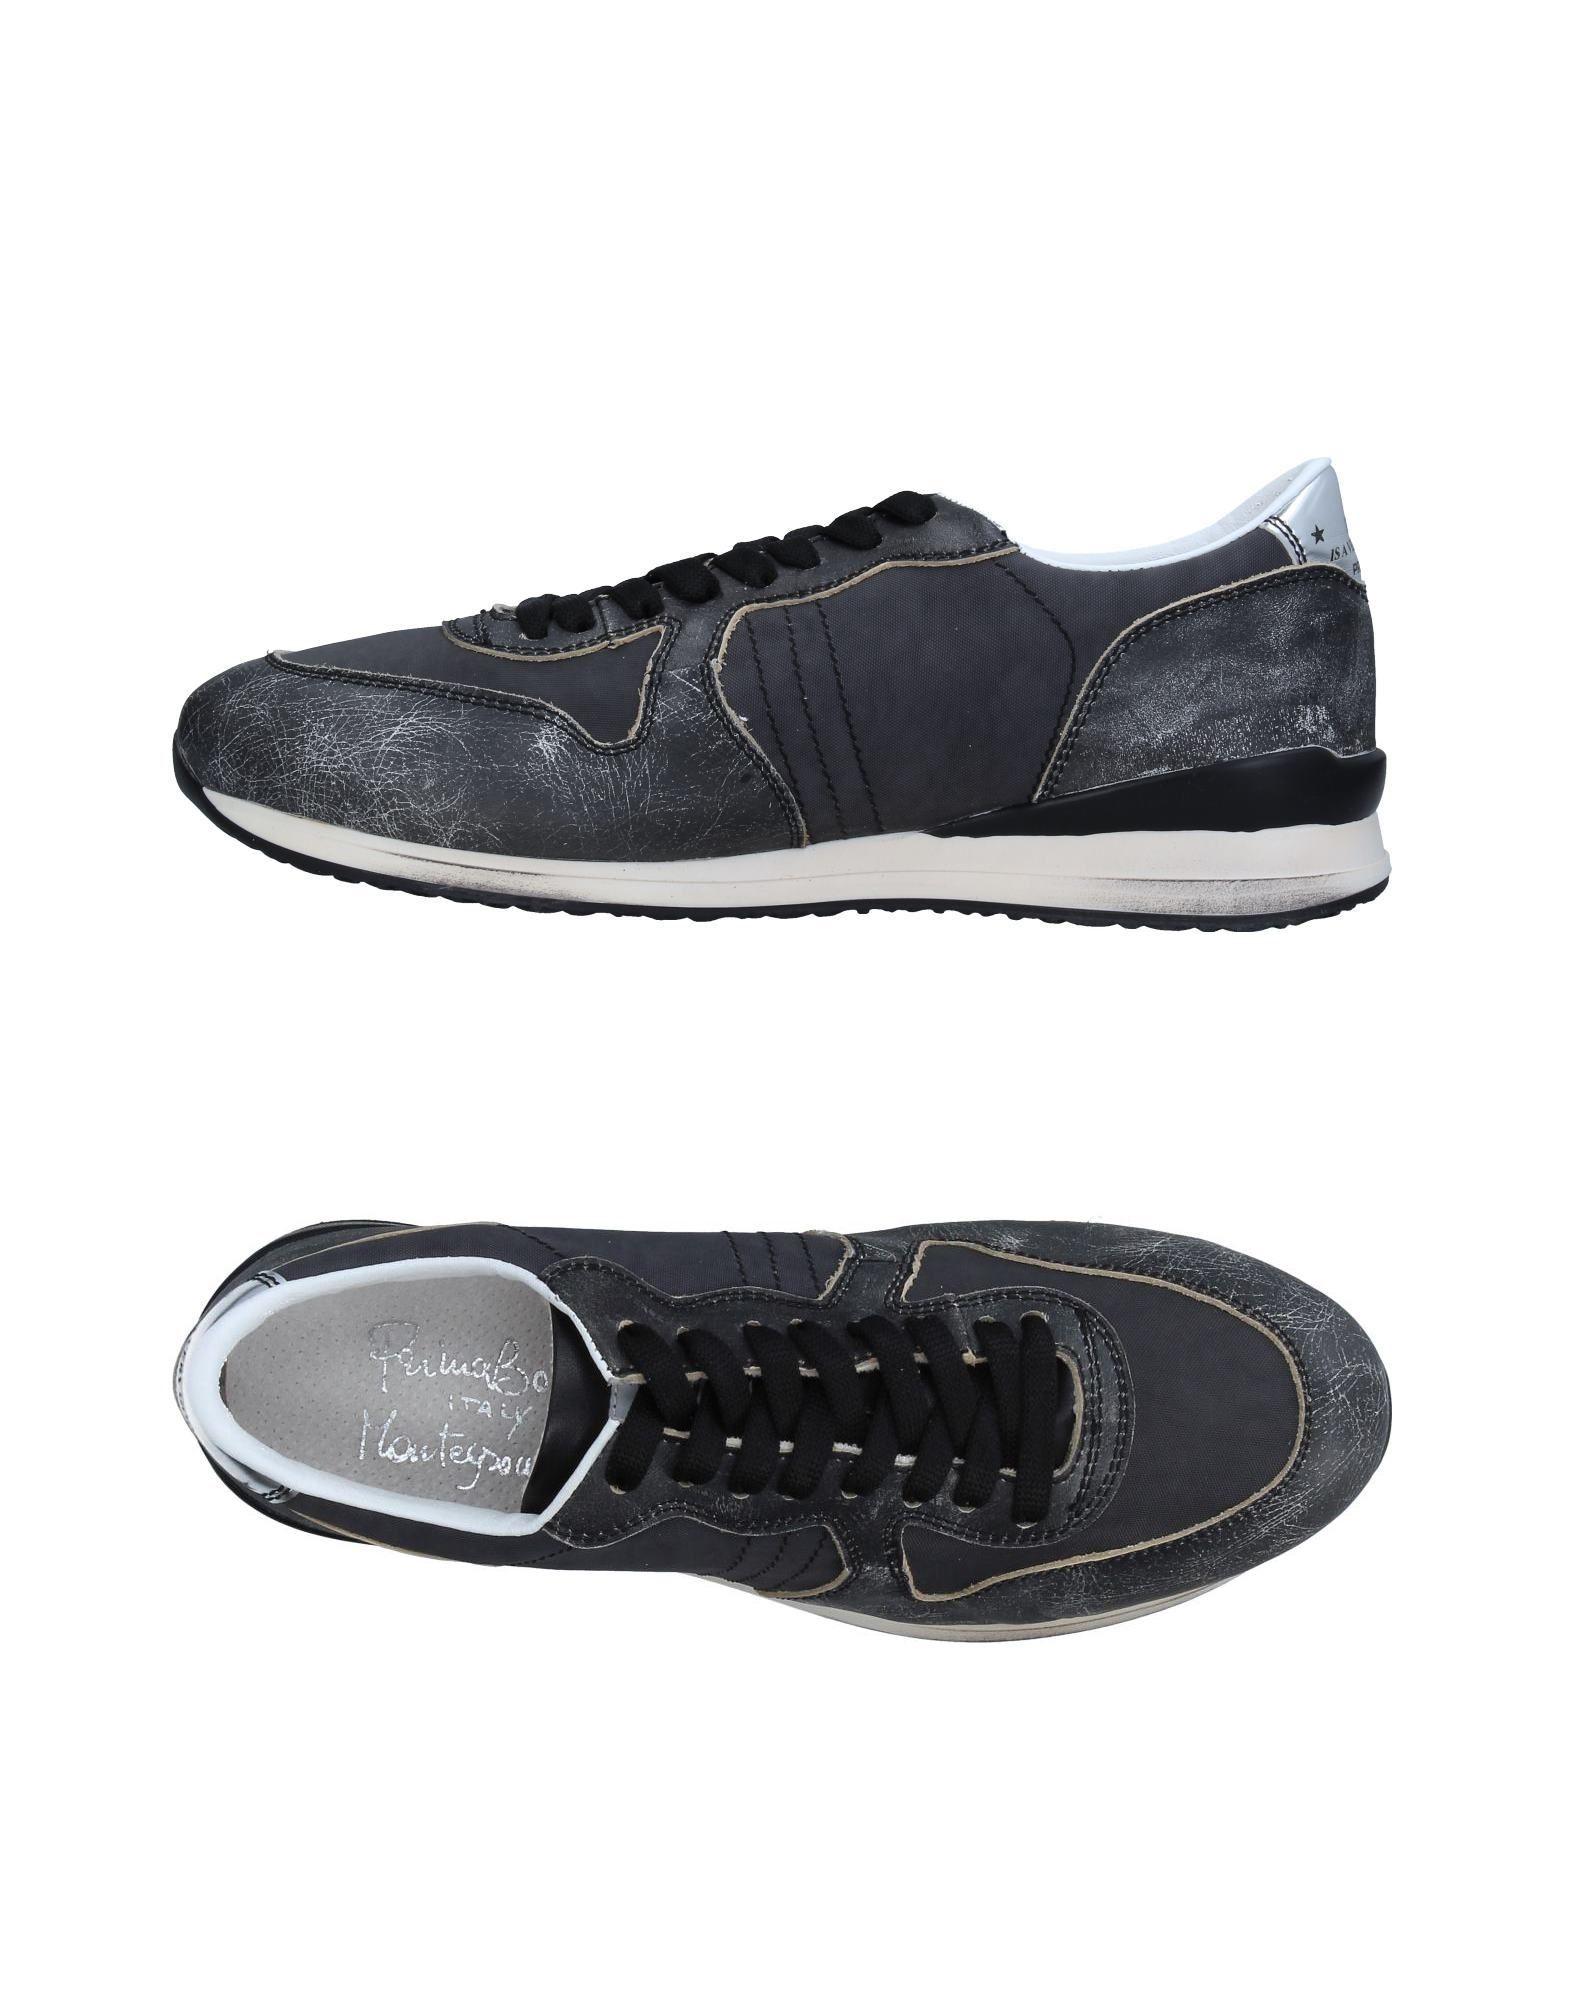 PRIMABASE Herren Low Sneakers & Tennisschuhe Farbe Granitgrau Größe 9 jetztbilligerkaufen